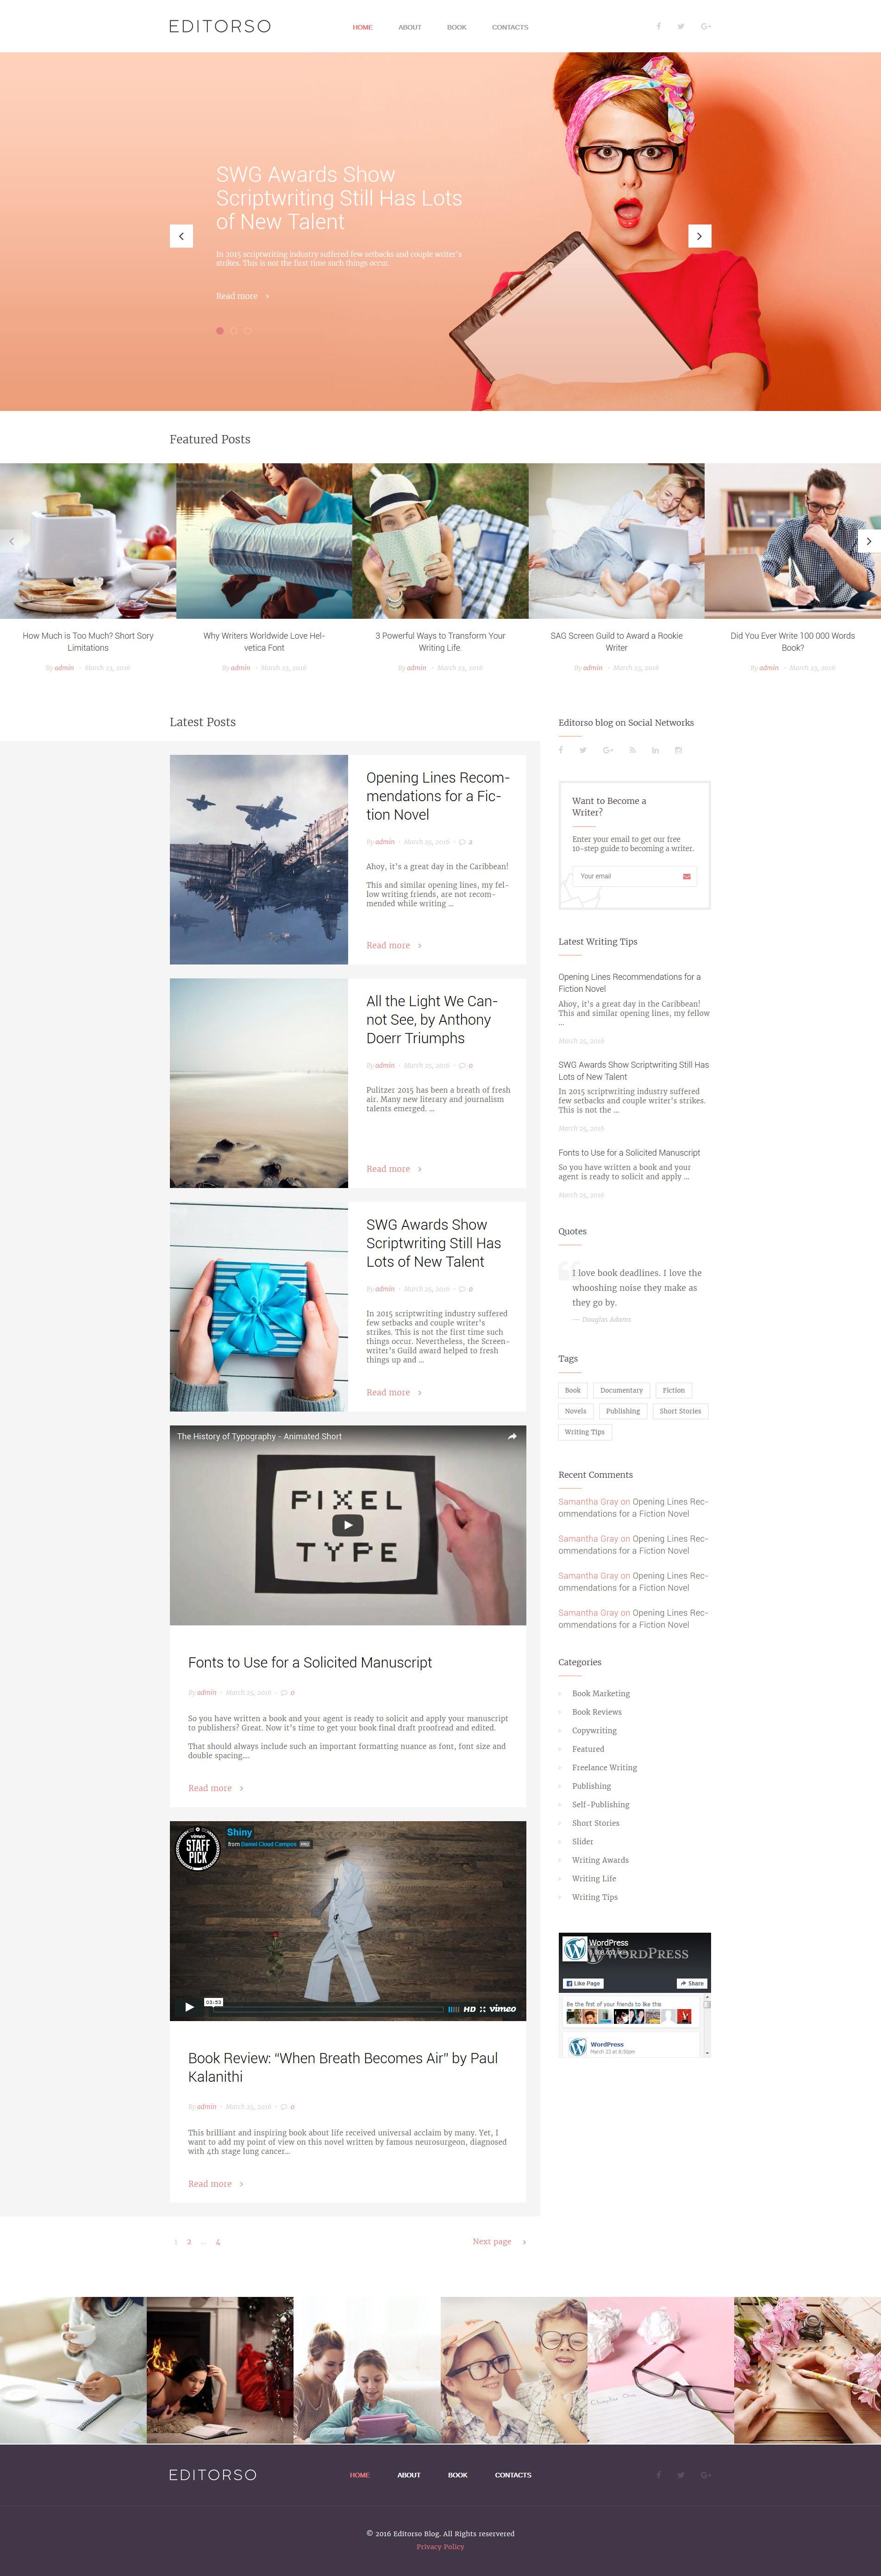 """Editorso - Journalist Blog"" - адаптивний WordPress шаблон №58513"